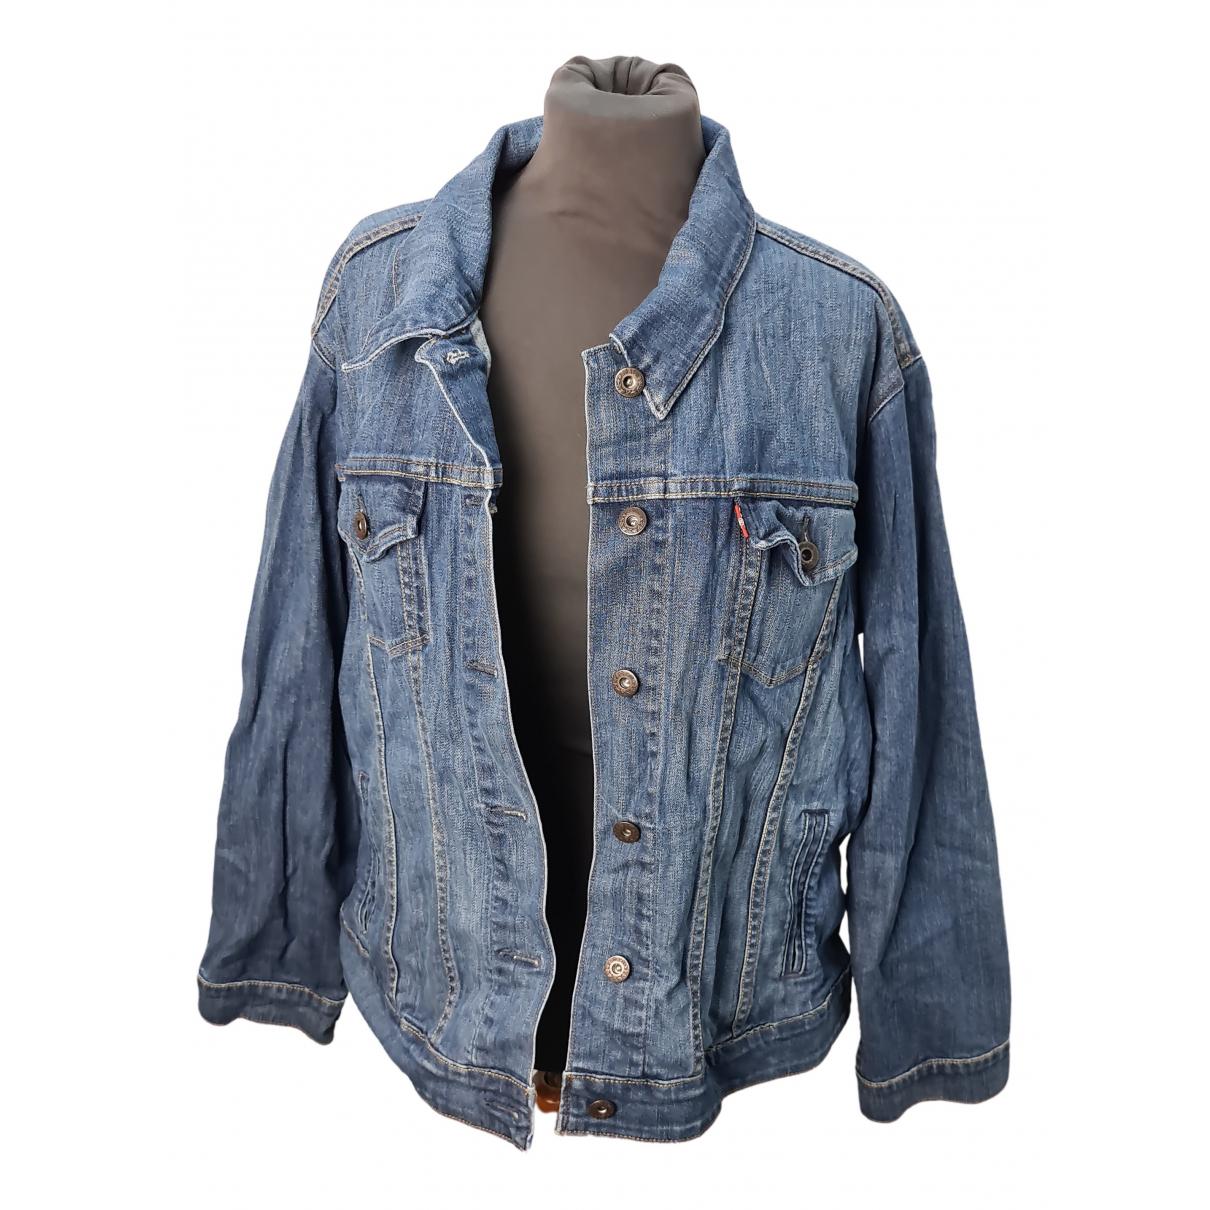 Levis N Cotton jacket for Women XXL International